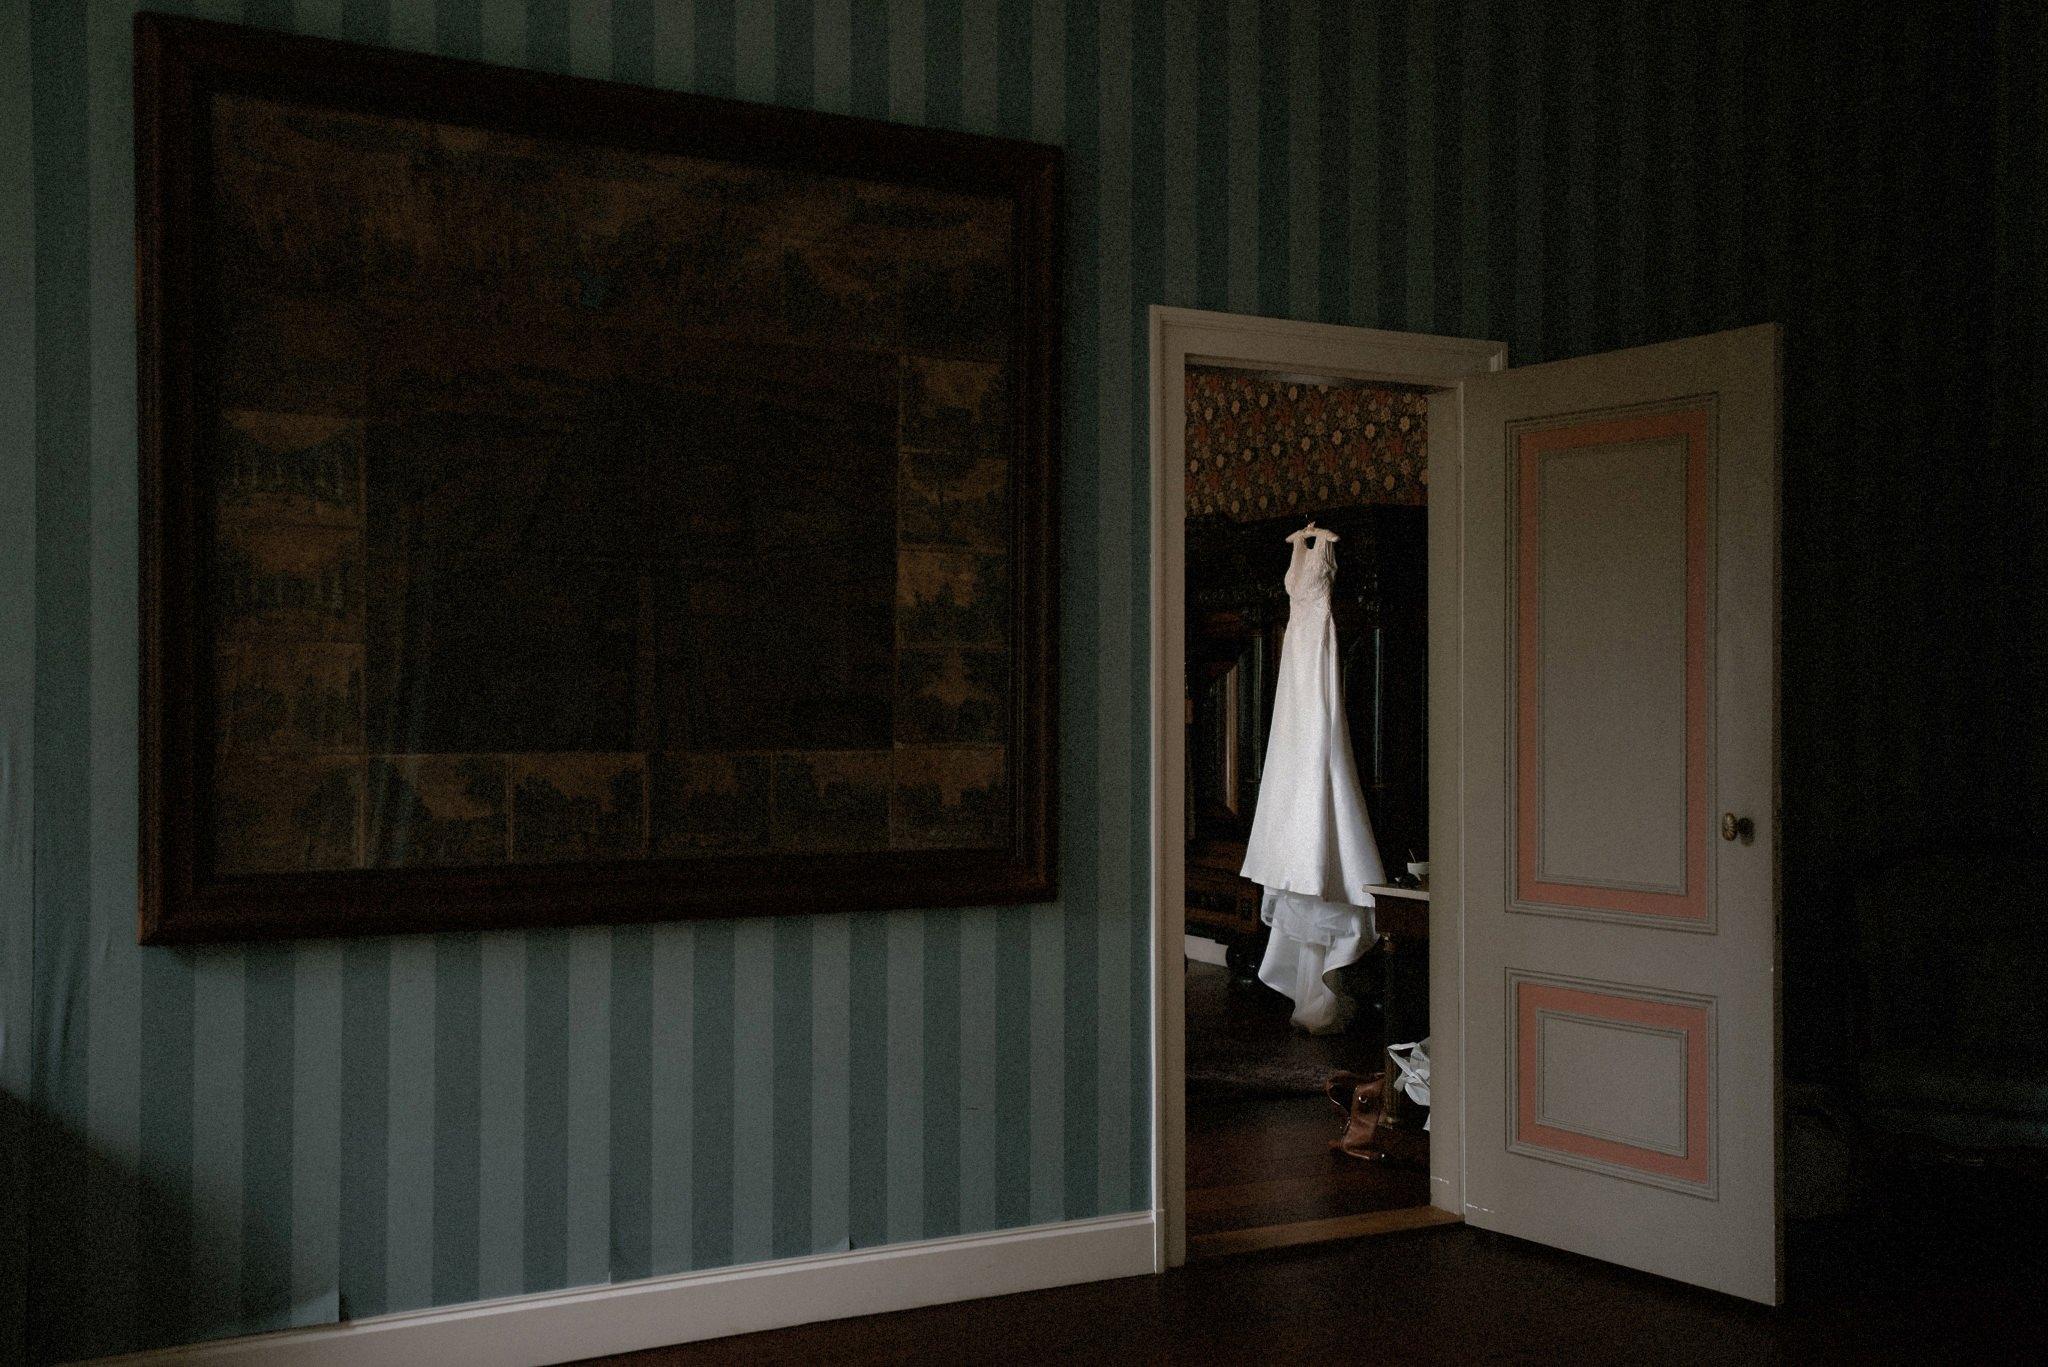 Bruidsfotografie Buitenplaats Sparrendaal - Naomi van der Kraan 0003.jpg